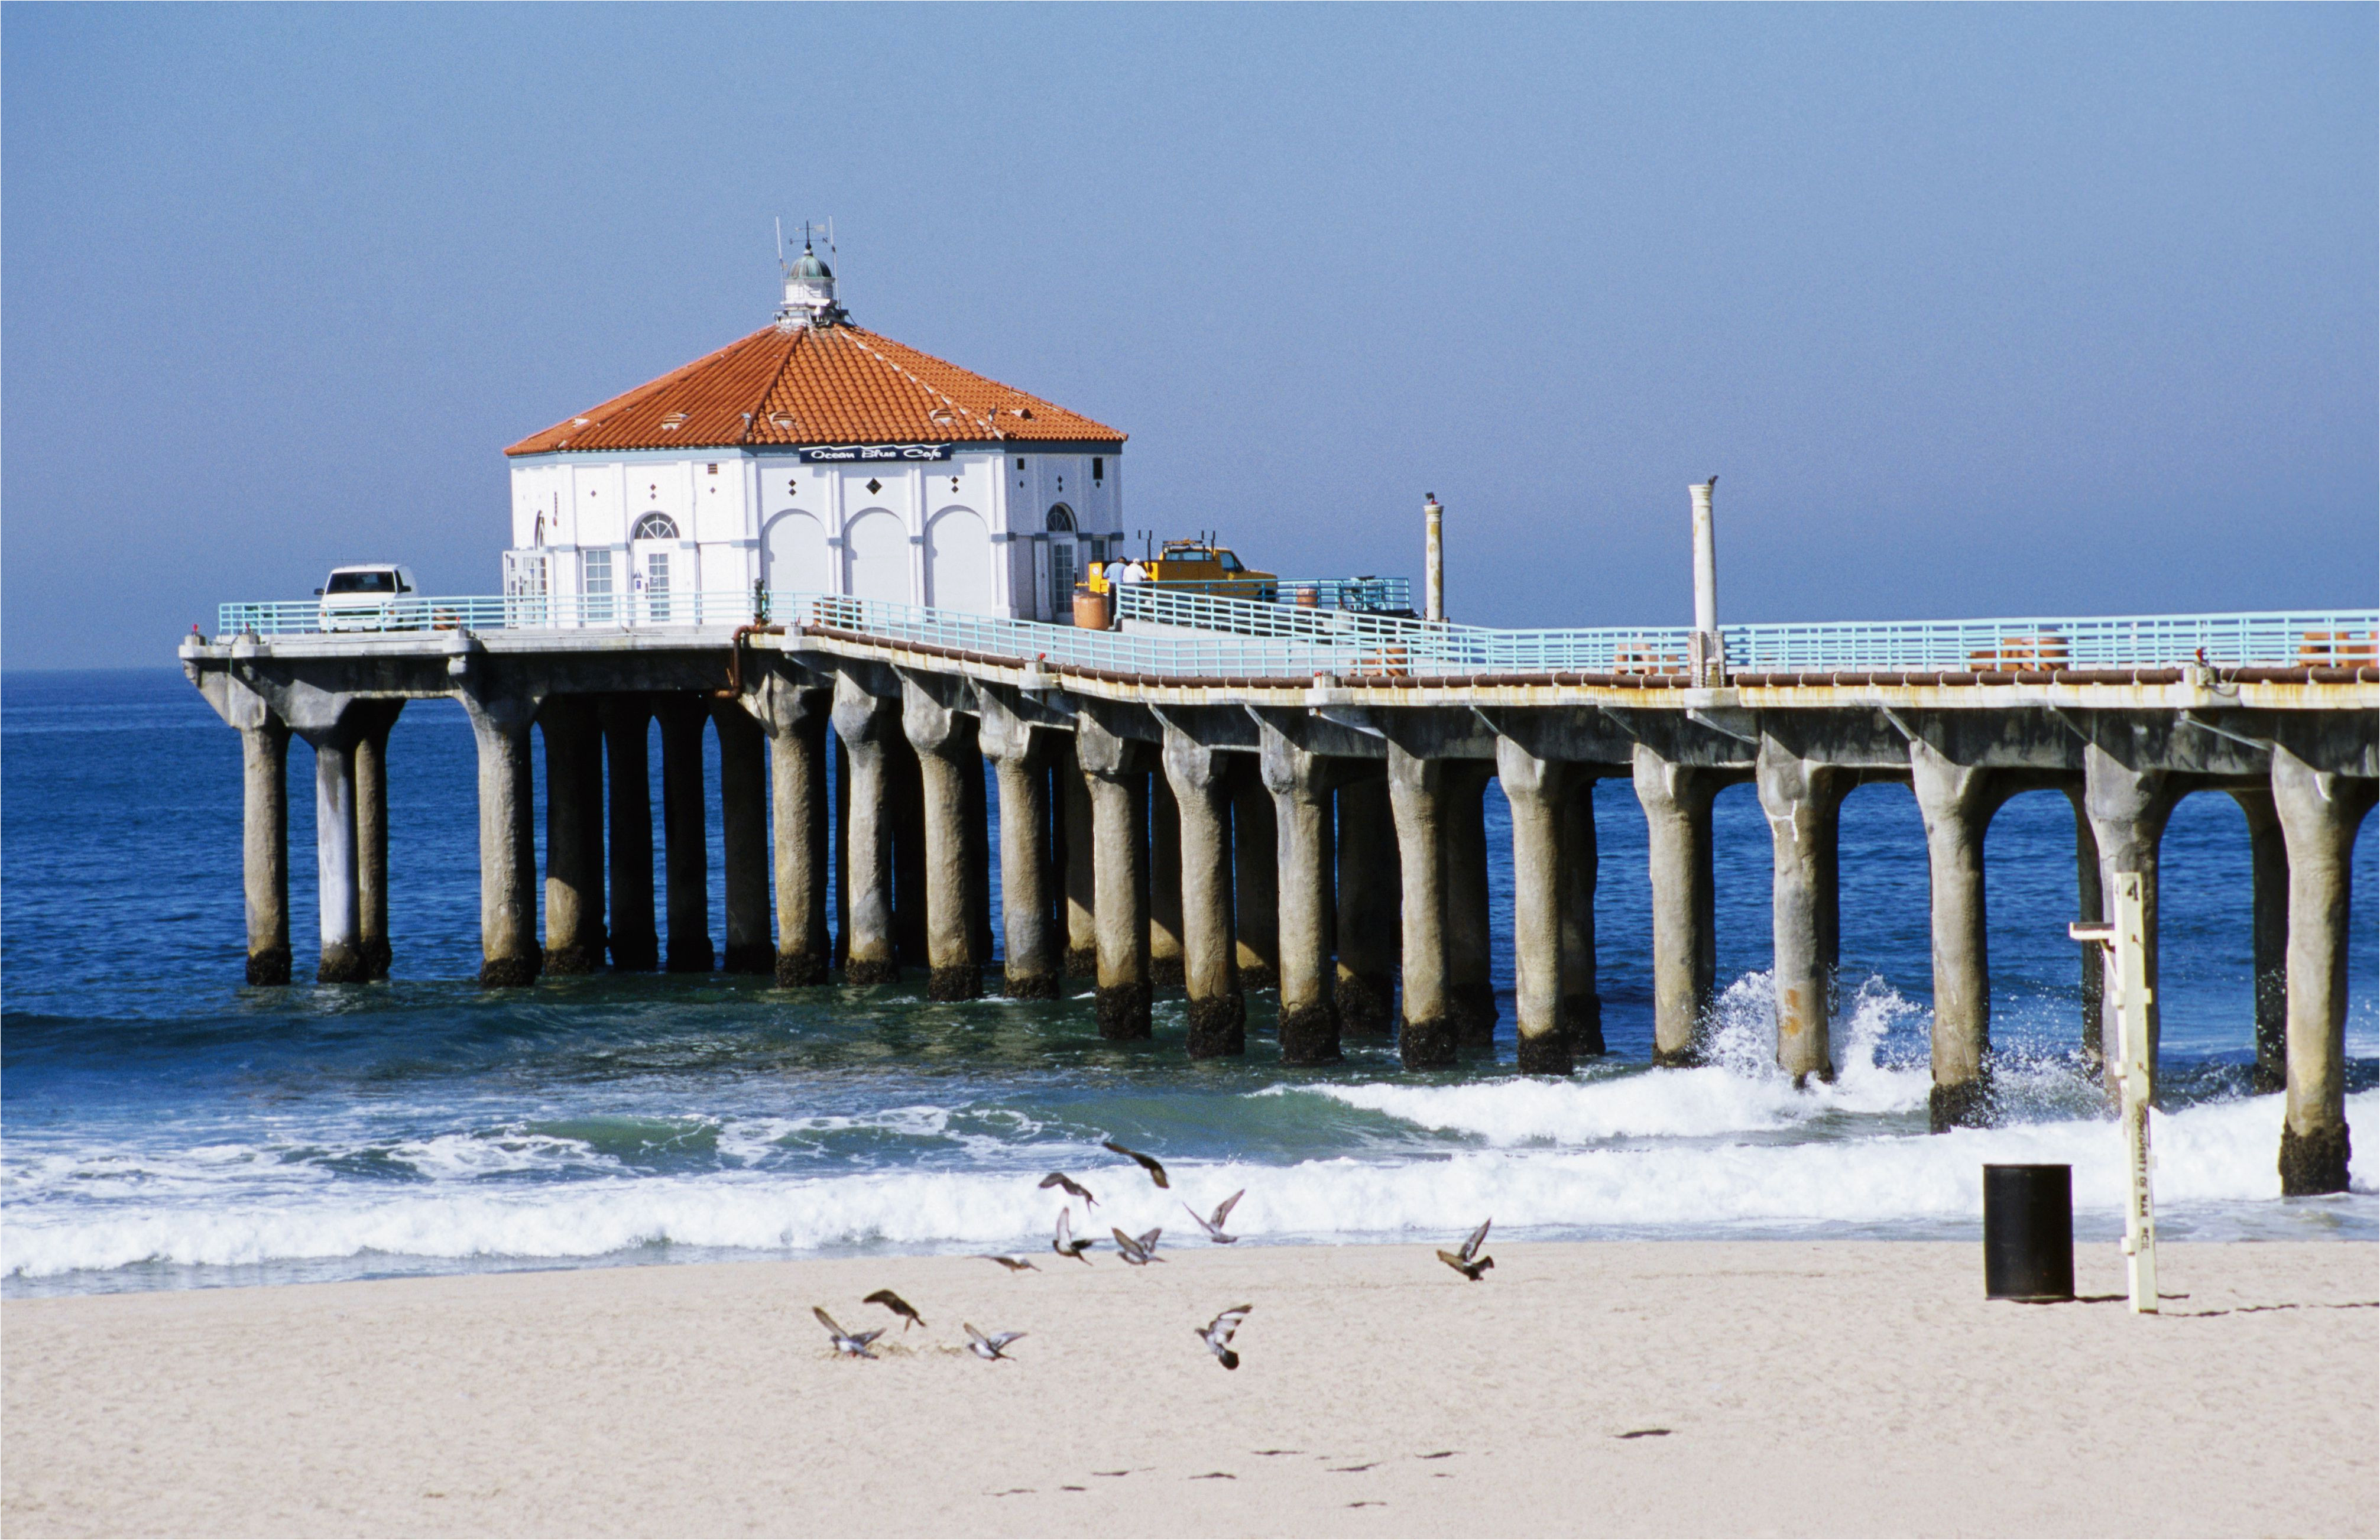 Map Of Hermosa Beach California where to Stay In Manhattan Beach Hermosa Beach or Redondo Beach